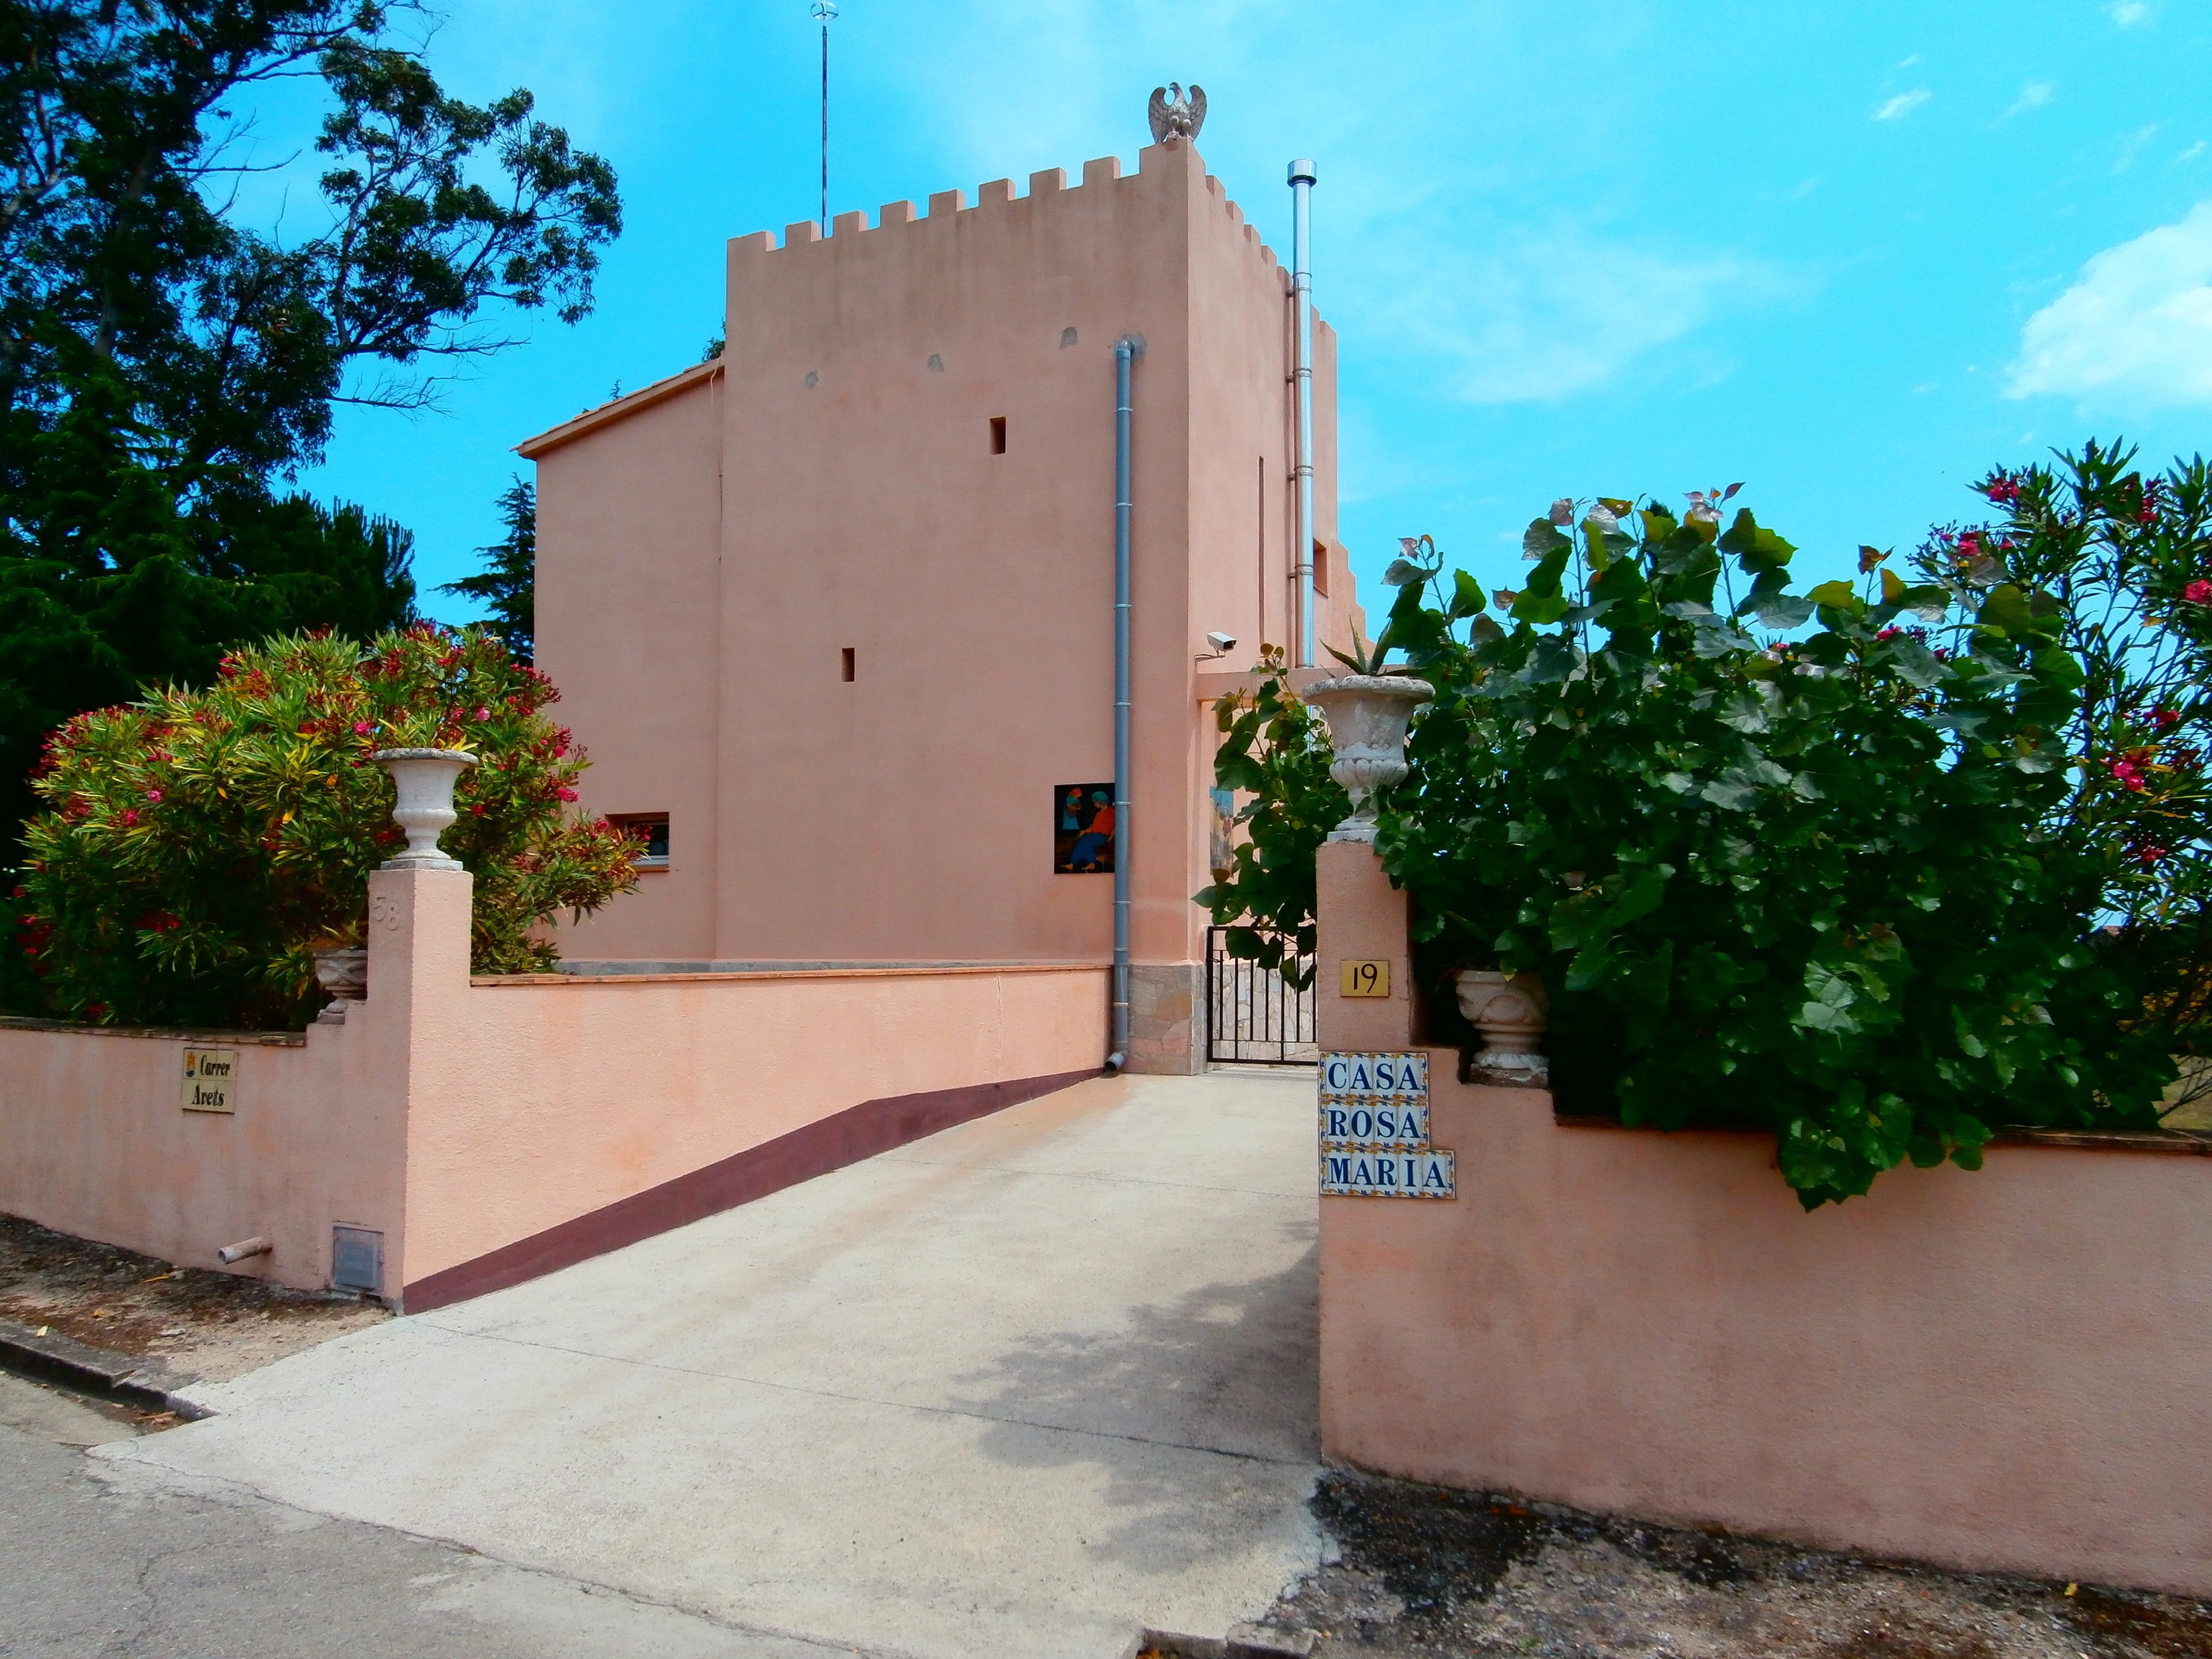 Villa Casa rosa Maria Ferienhaus in Spanien